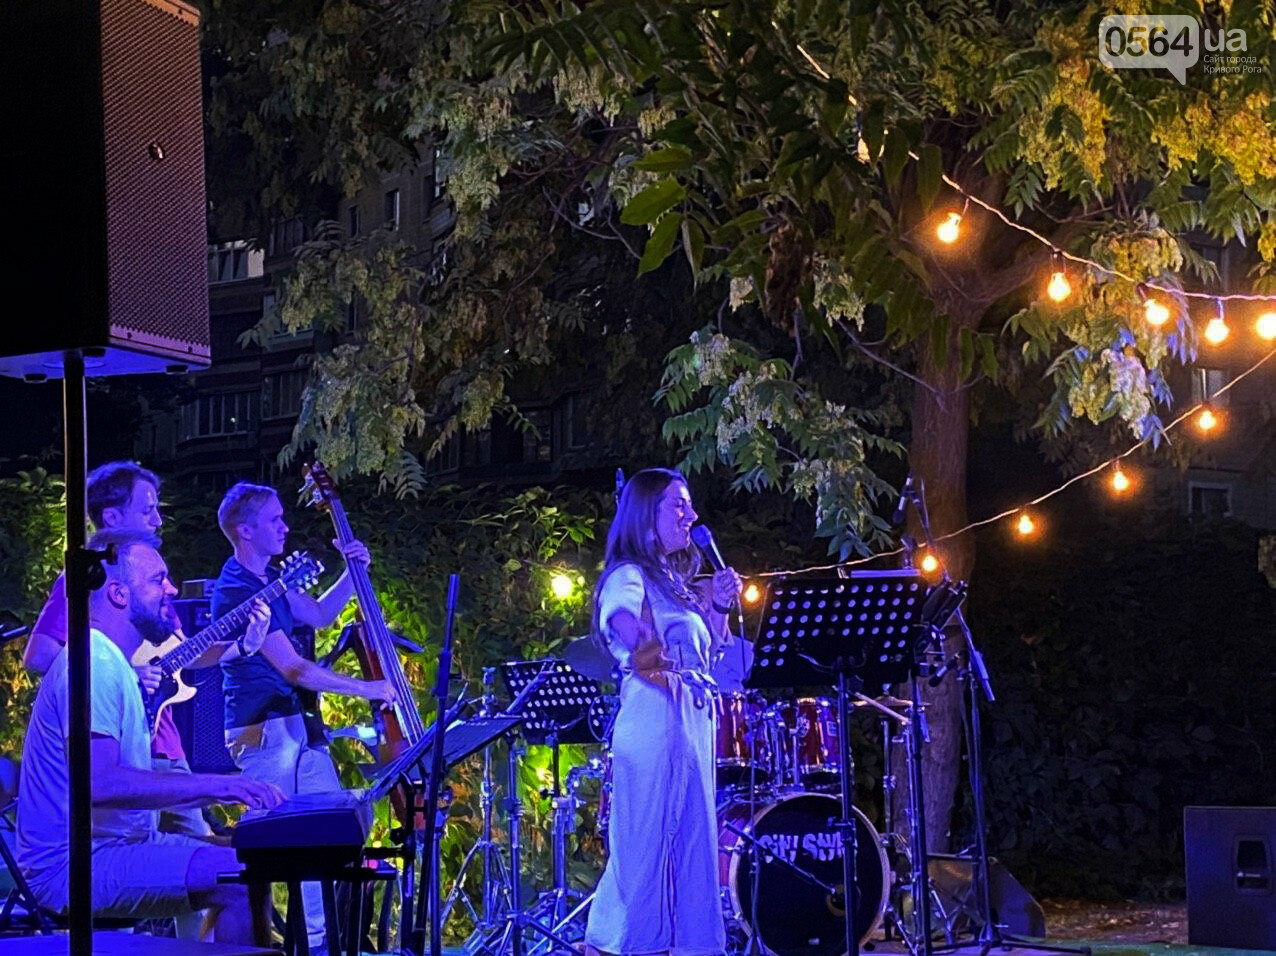 Под звездным небом криворожане наслаждались летним джазом от  Advantage Project, - ФОТО, ВИДЕО , фото-52